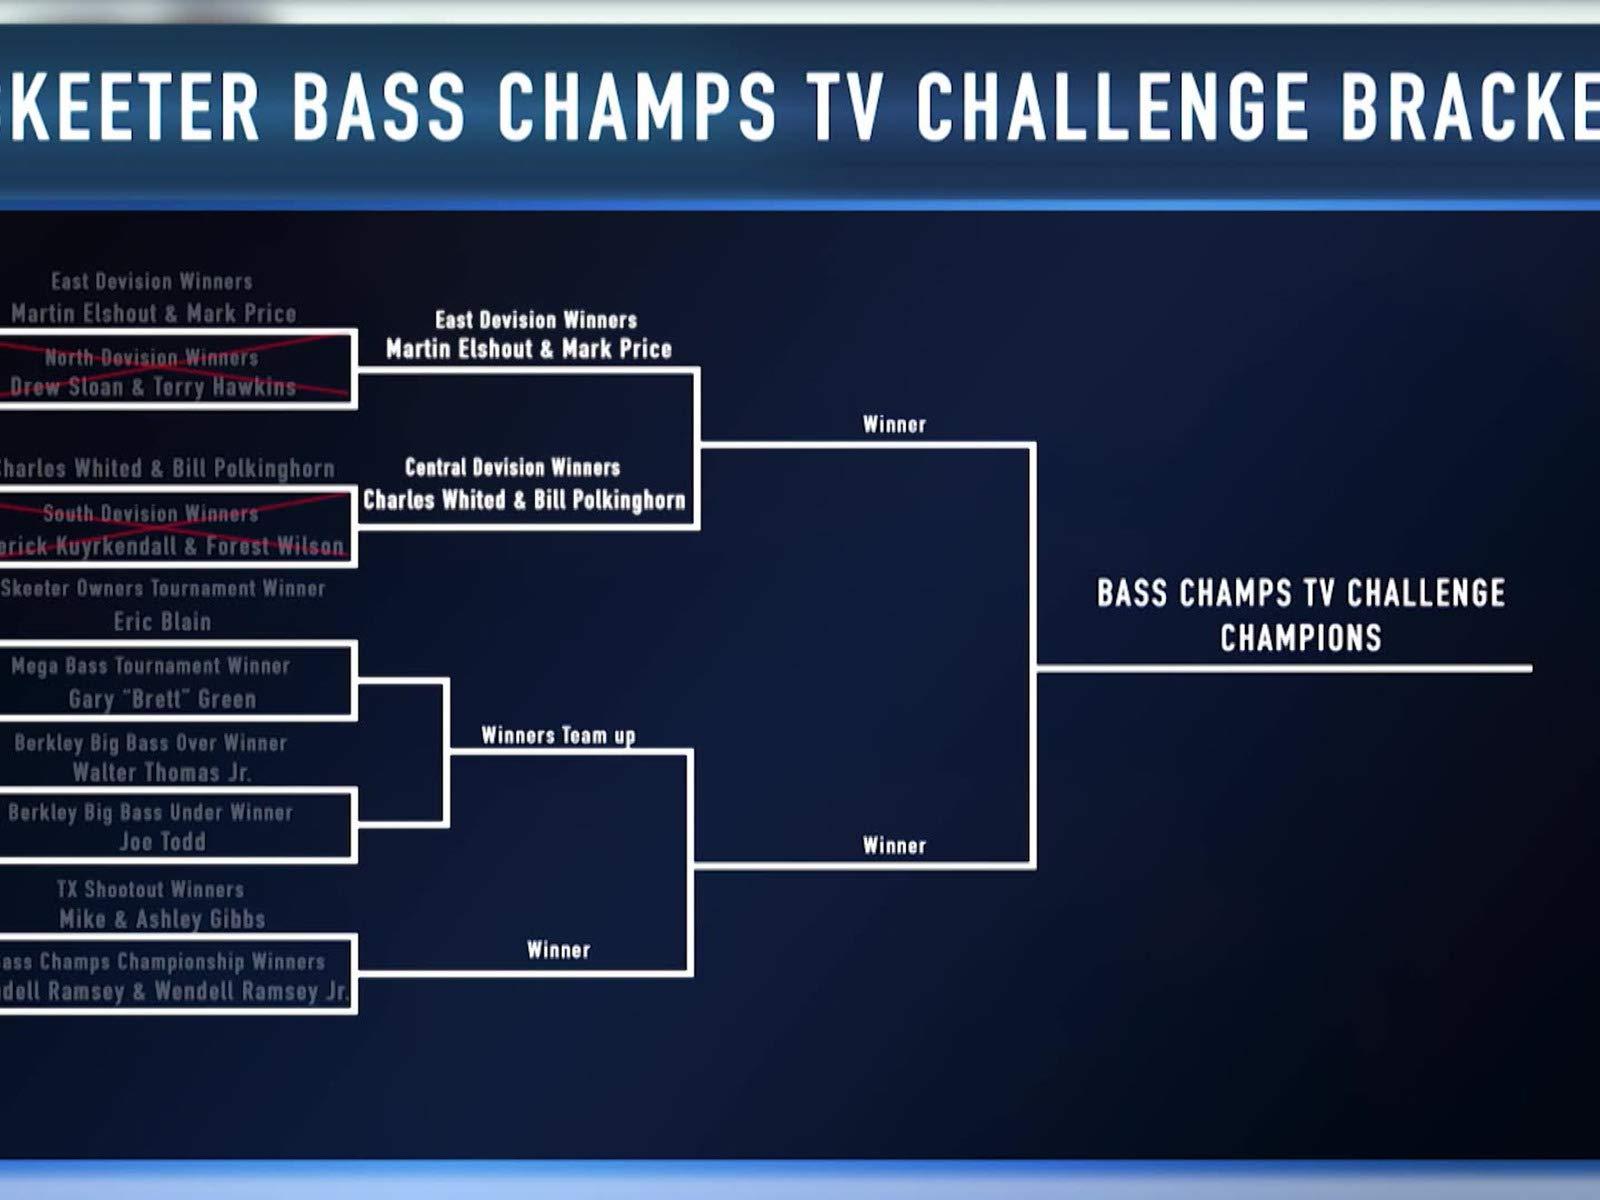 Amazoncom Watch Skeeter Bass Champs with Fish Fishburne   Season 1600x1200